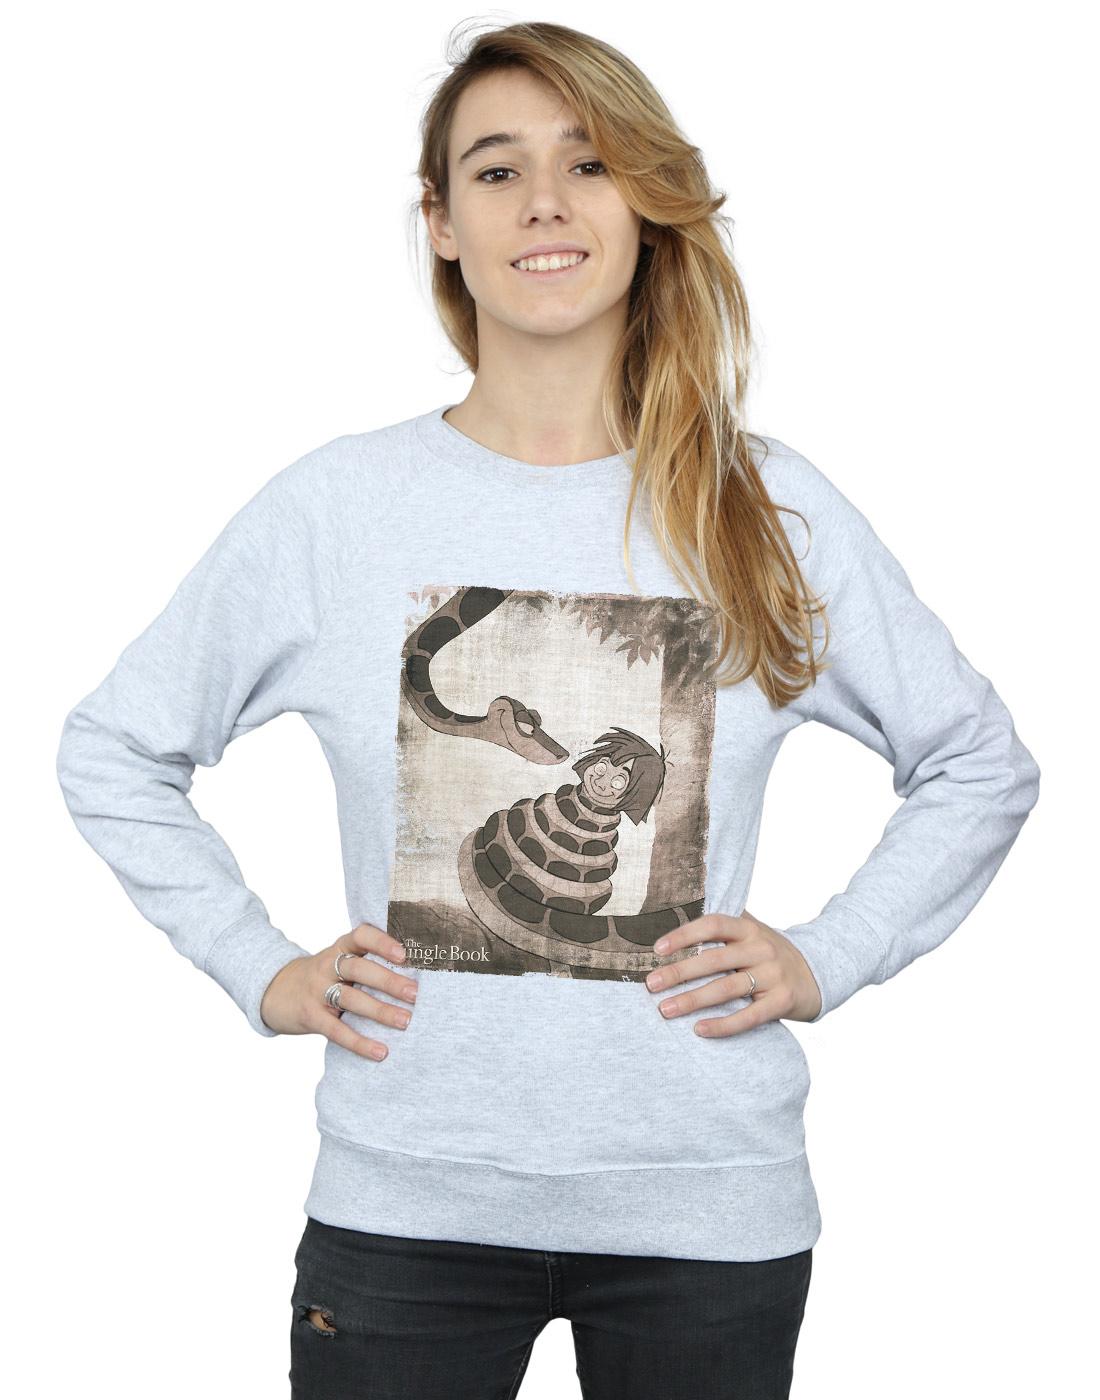 ce15e85ae Disney Women s The Jungle Book Hypnosis Sweatshirt